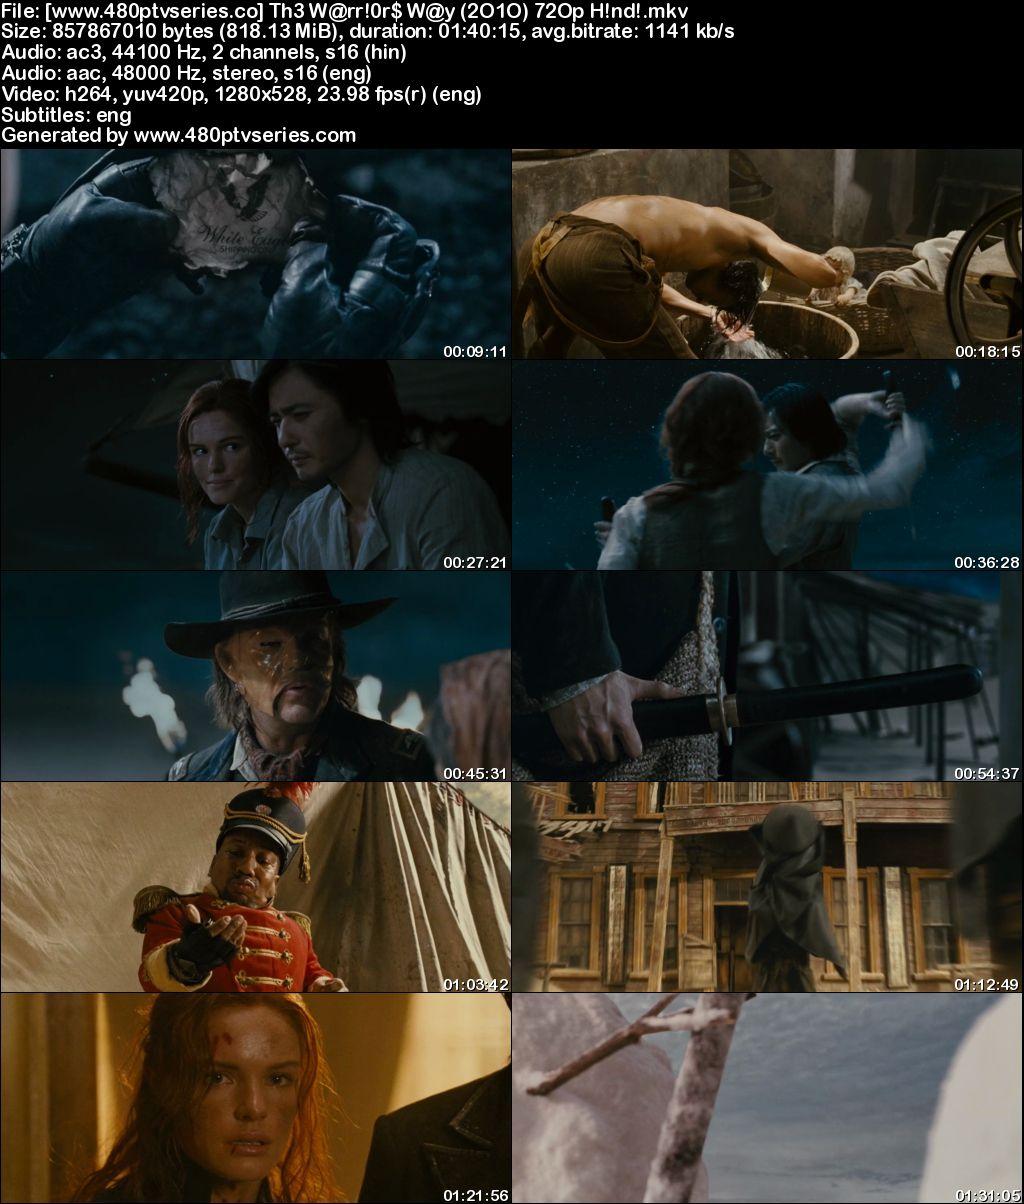 The Warrior's Way (2010) Full Hindi Dual Audio Movie Download 480p 720p BluRay Free Watch Online Full Movie Download Worldfree4u 9xmovies